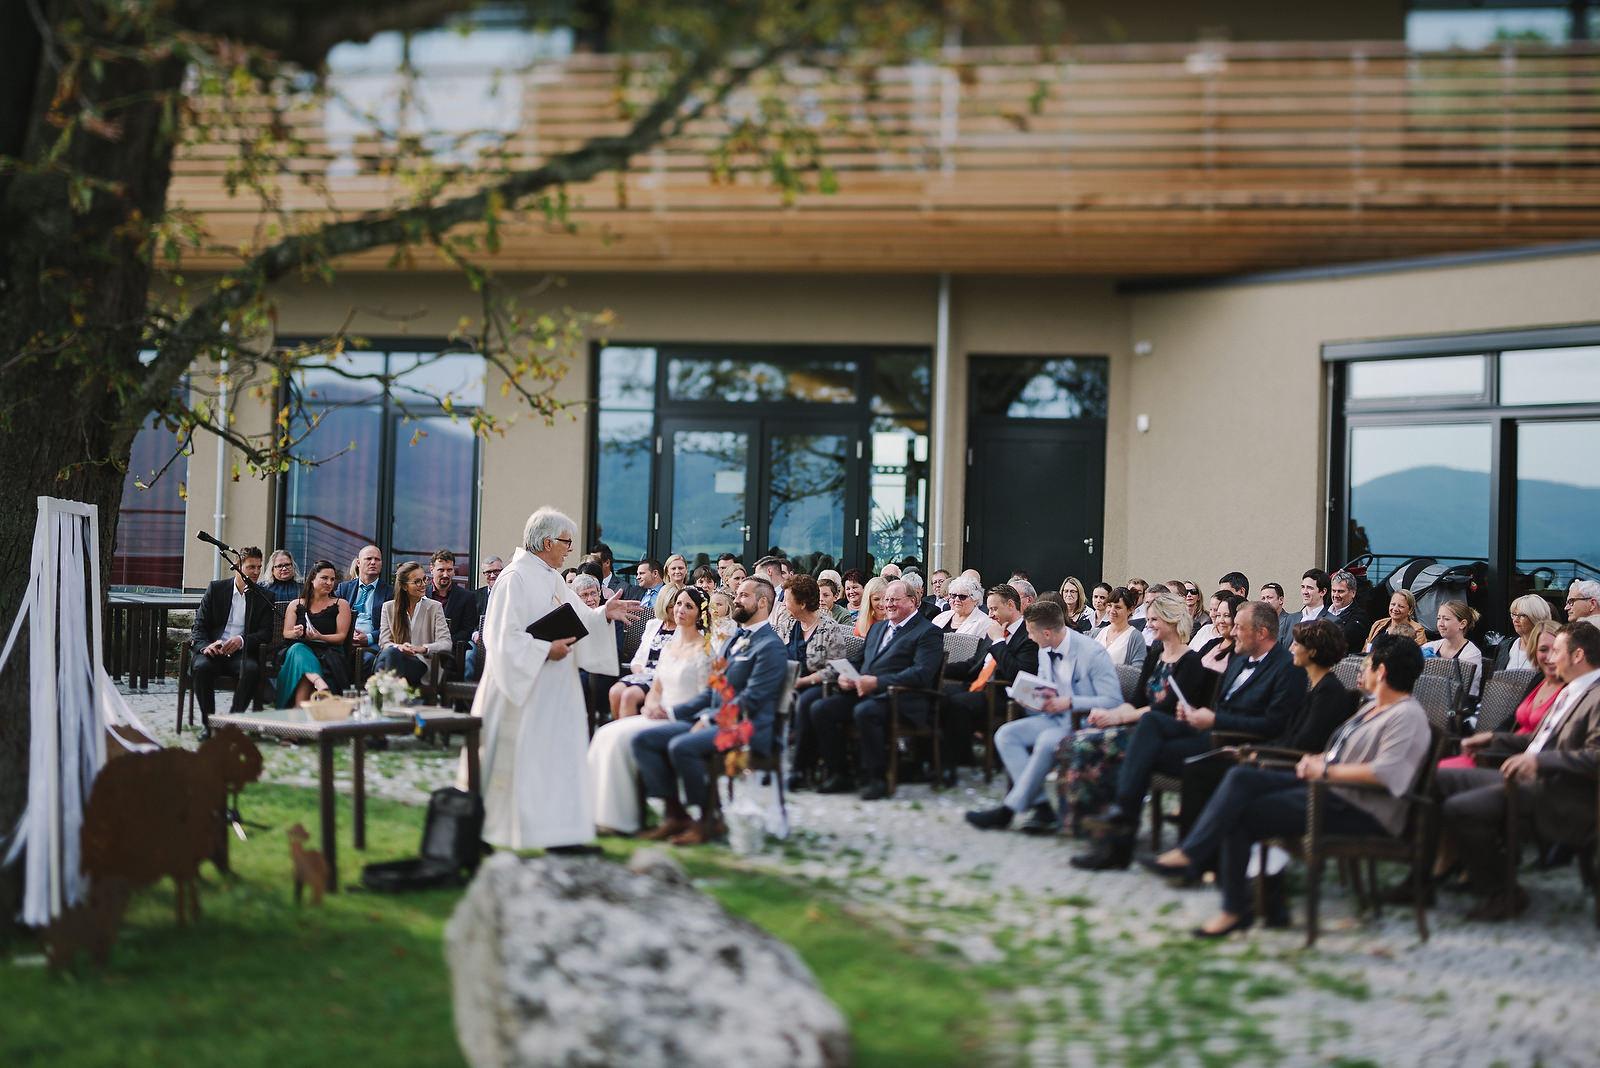 Fotograf Konstanz - Hochzeitsfotograf Reutlingen Achalm Hochzeit EFP 47 - Als Hochzeitsfotograf auf der Achalm, Reutlingen  - 38 -